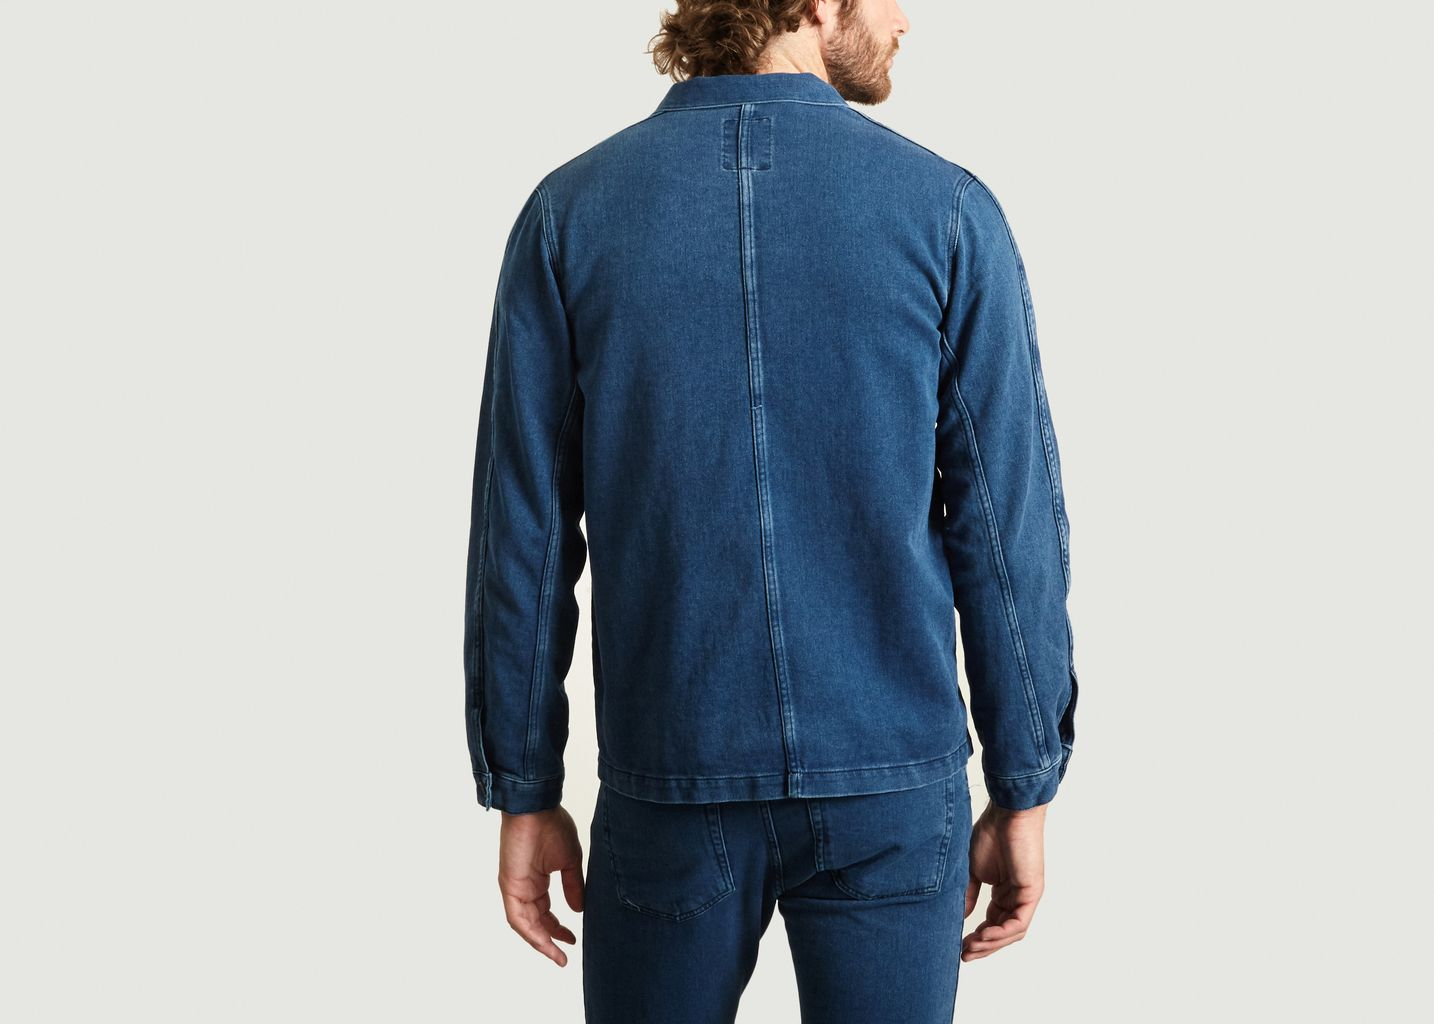 Veste de Comptoir - Bleu de Paname